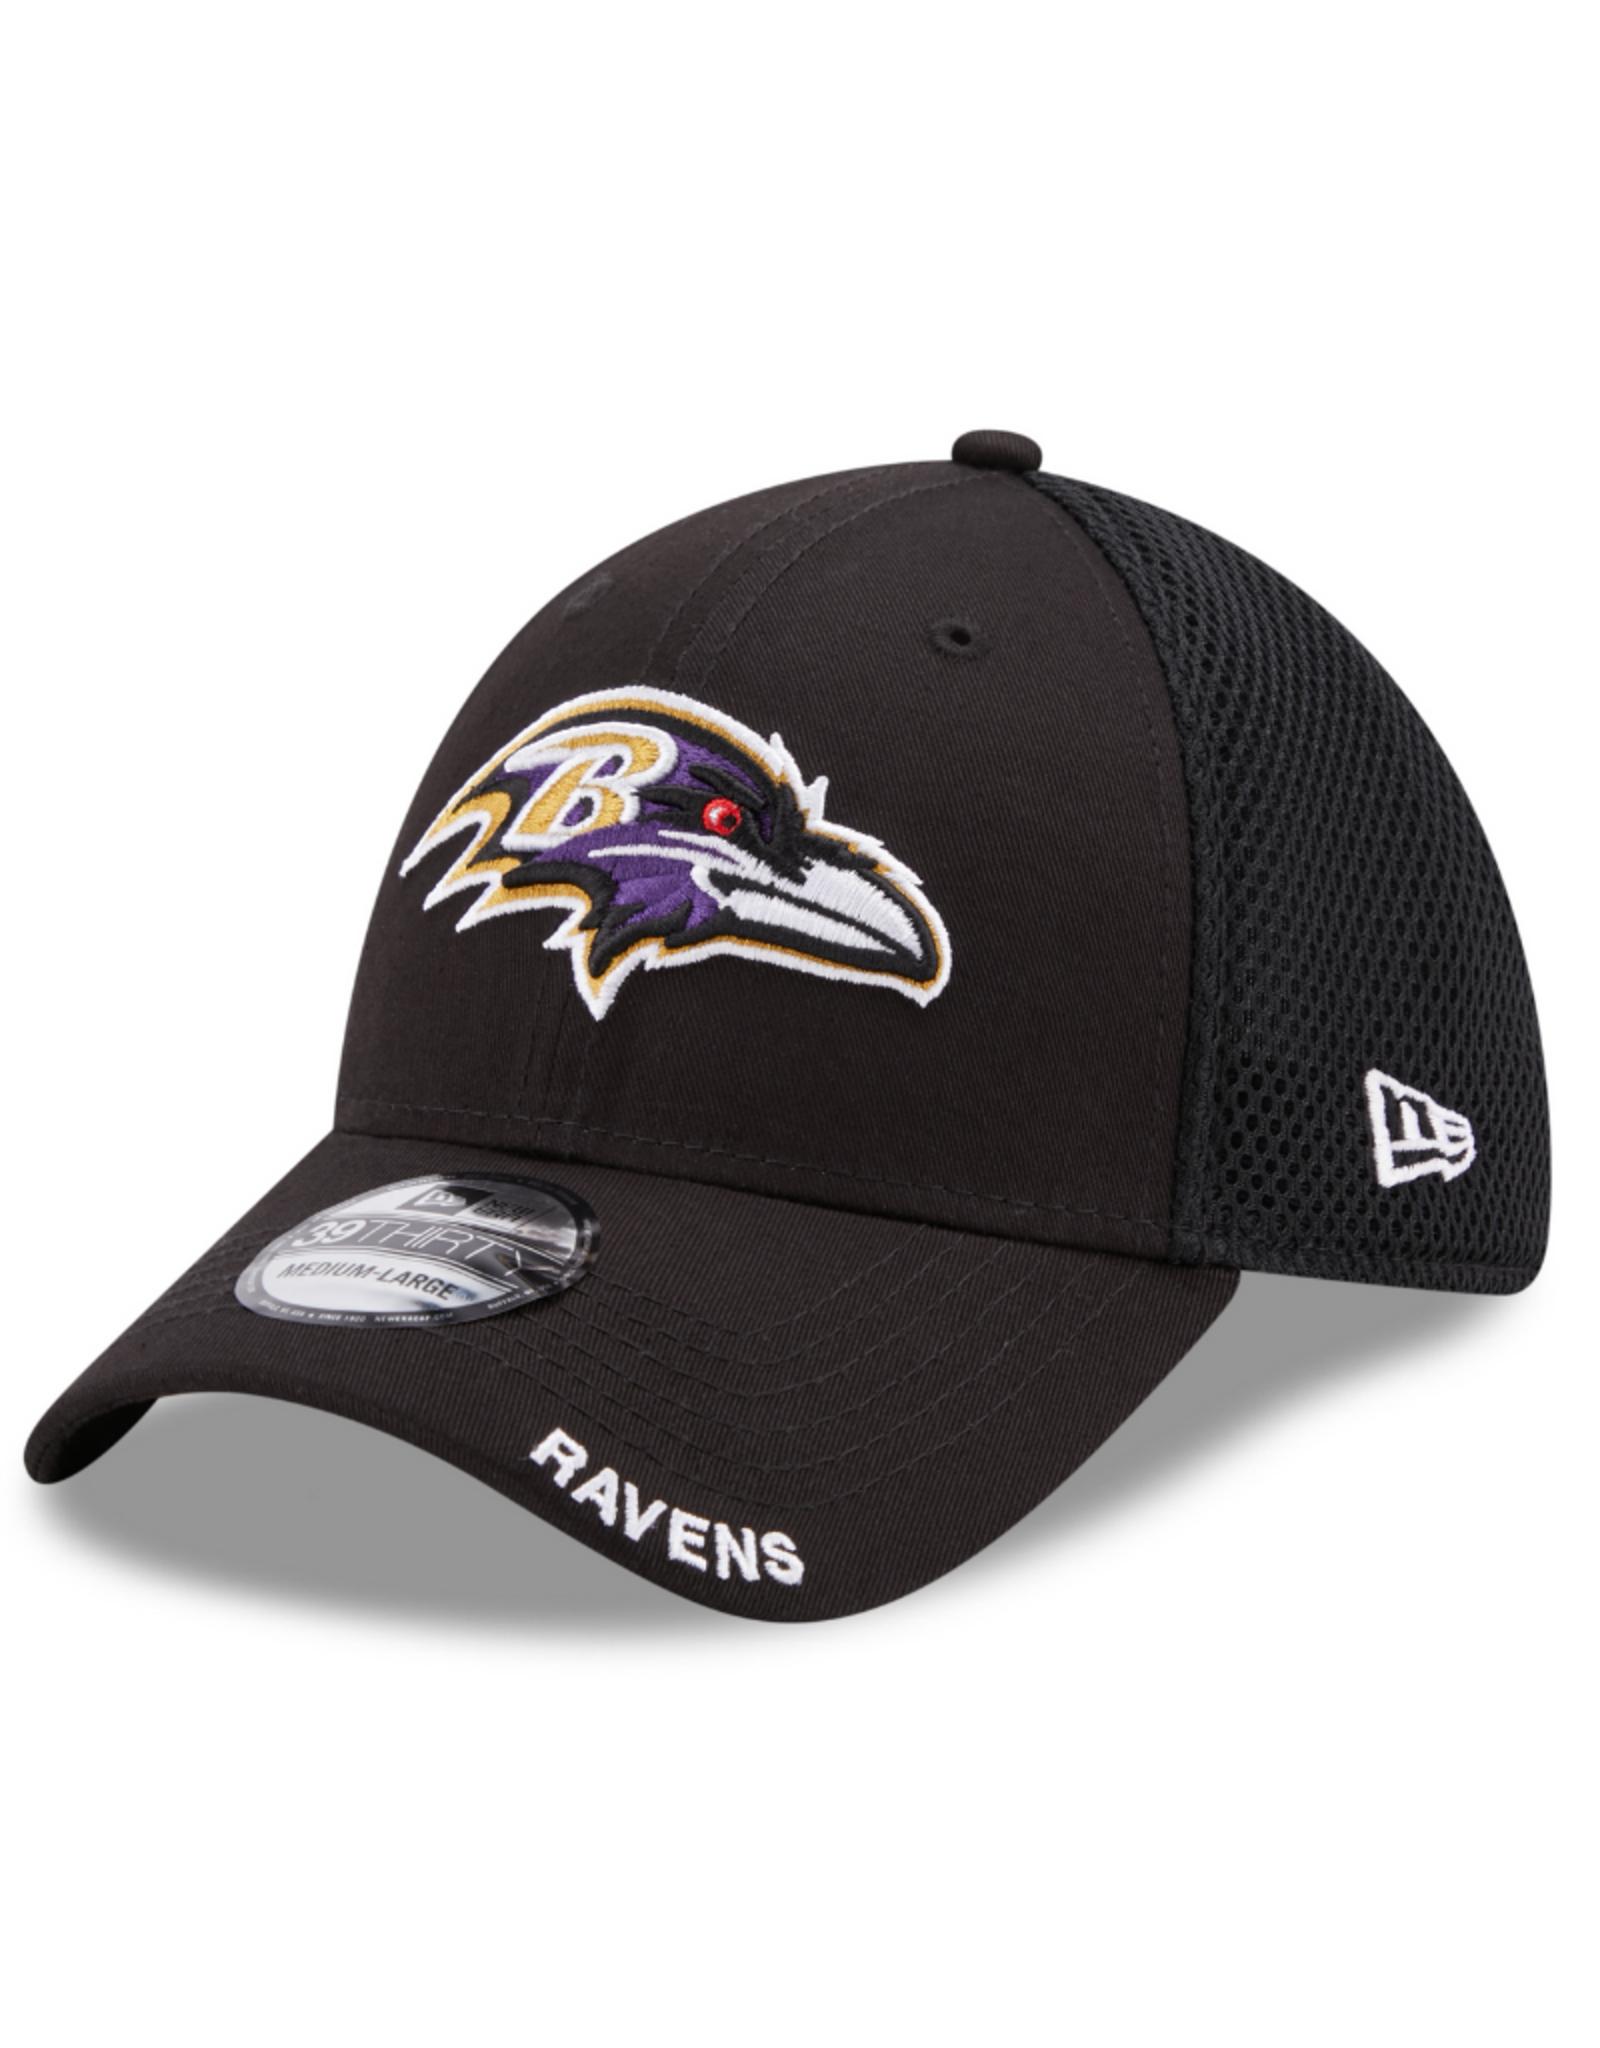 New Era Men's 39THIRTY Classic Neo B3 Hat Baltimore Ravens Black